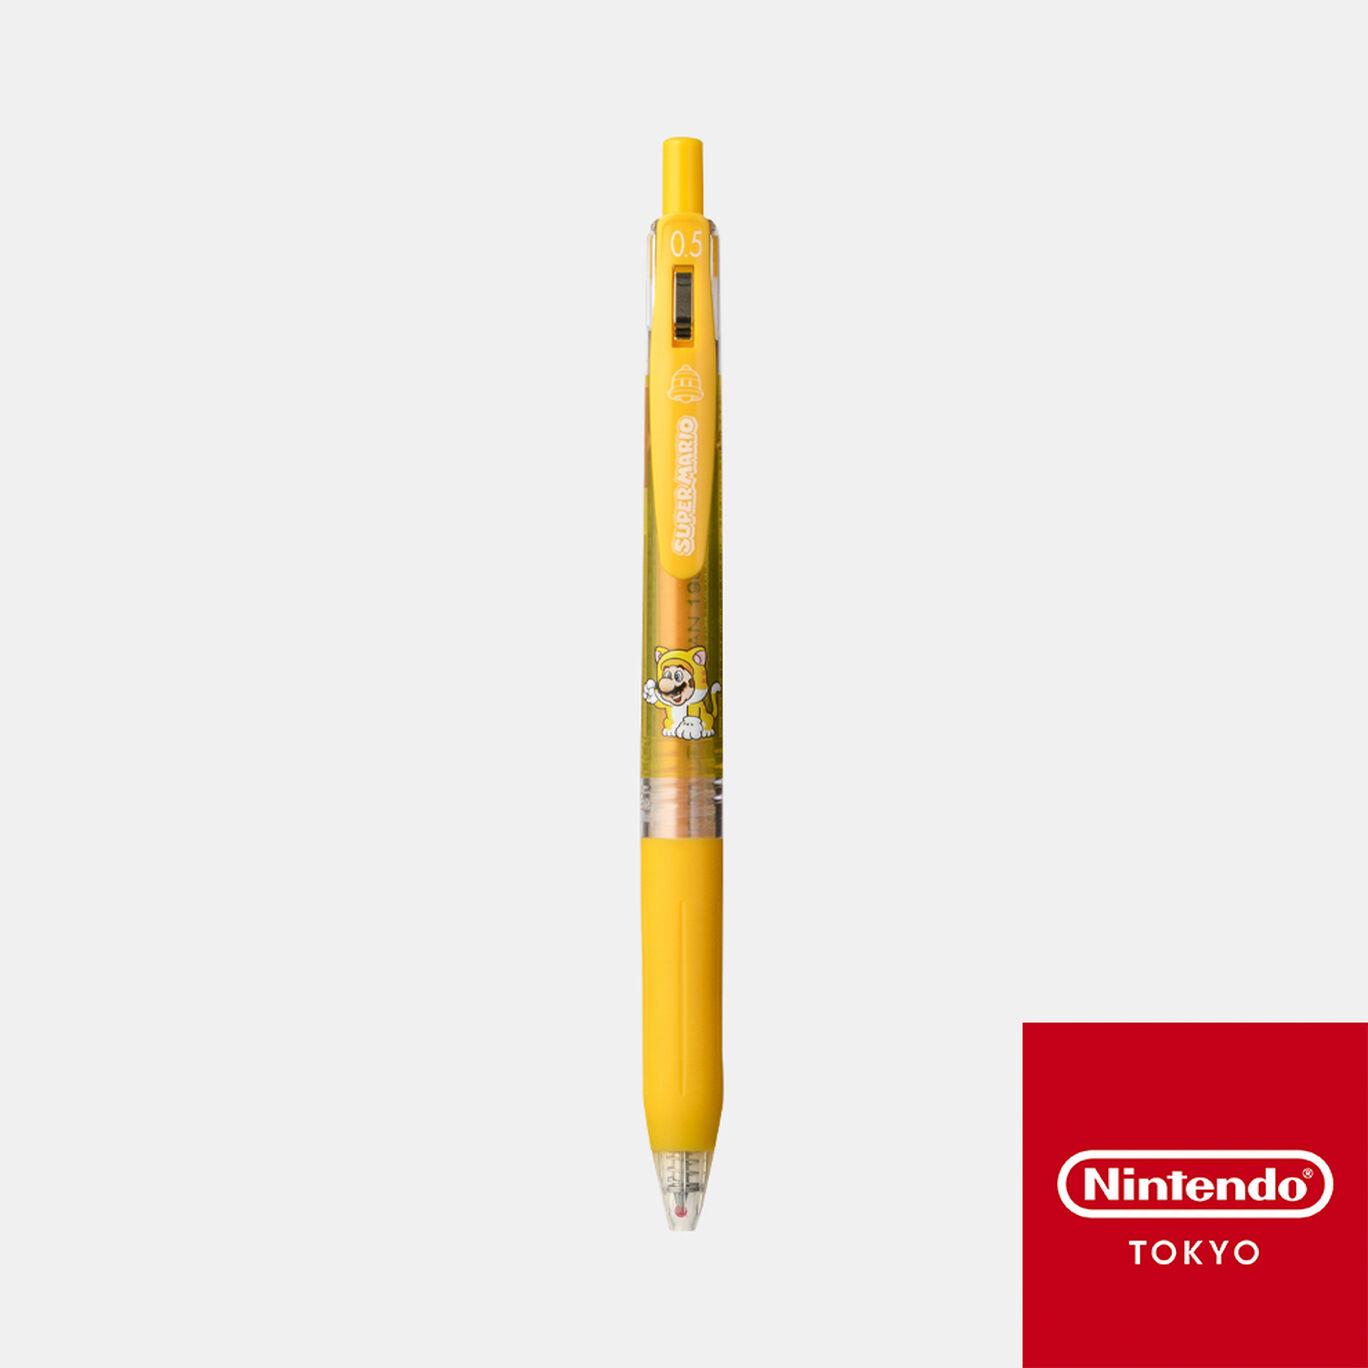 SARASAクリップ スーパーマリオ パワーアップ F【Nintendo TOKYO取り扱い商品】